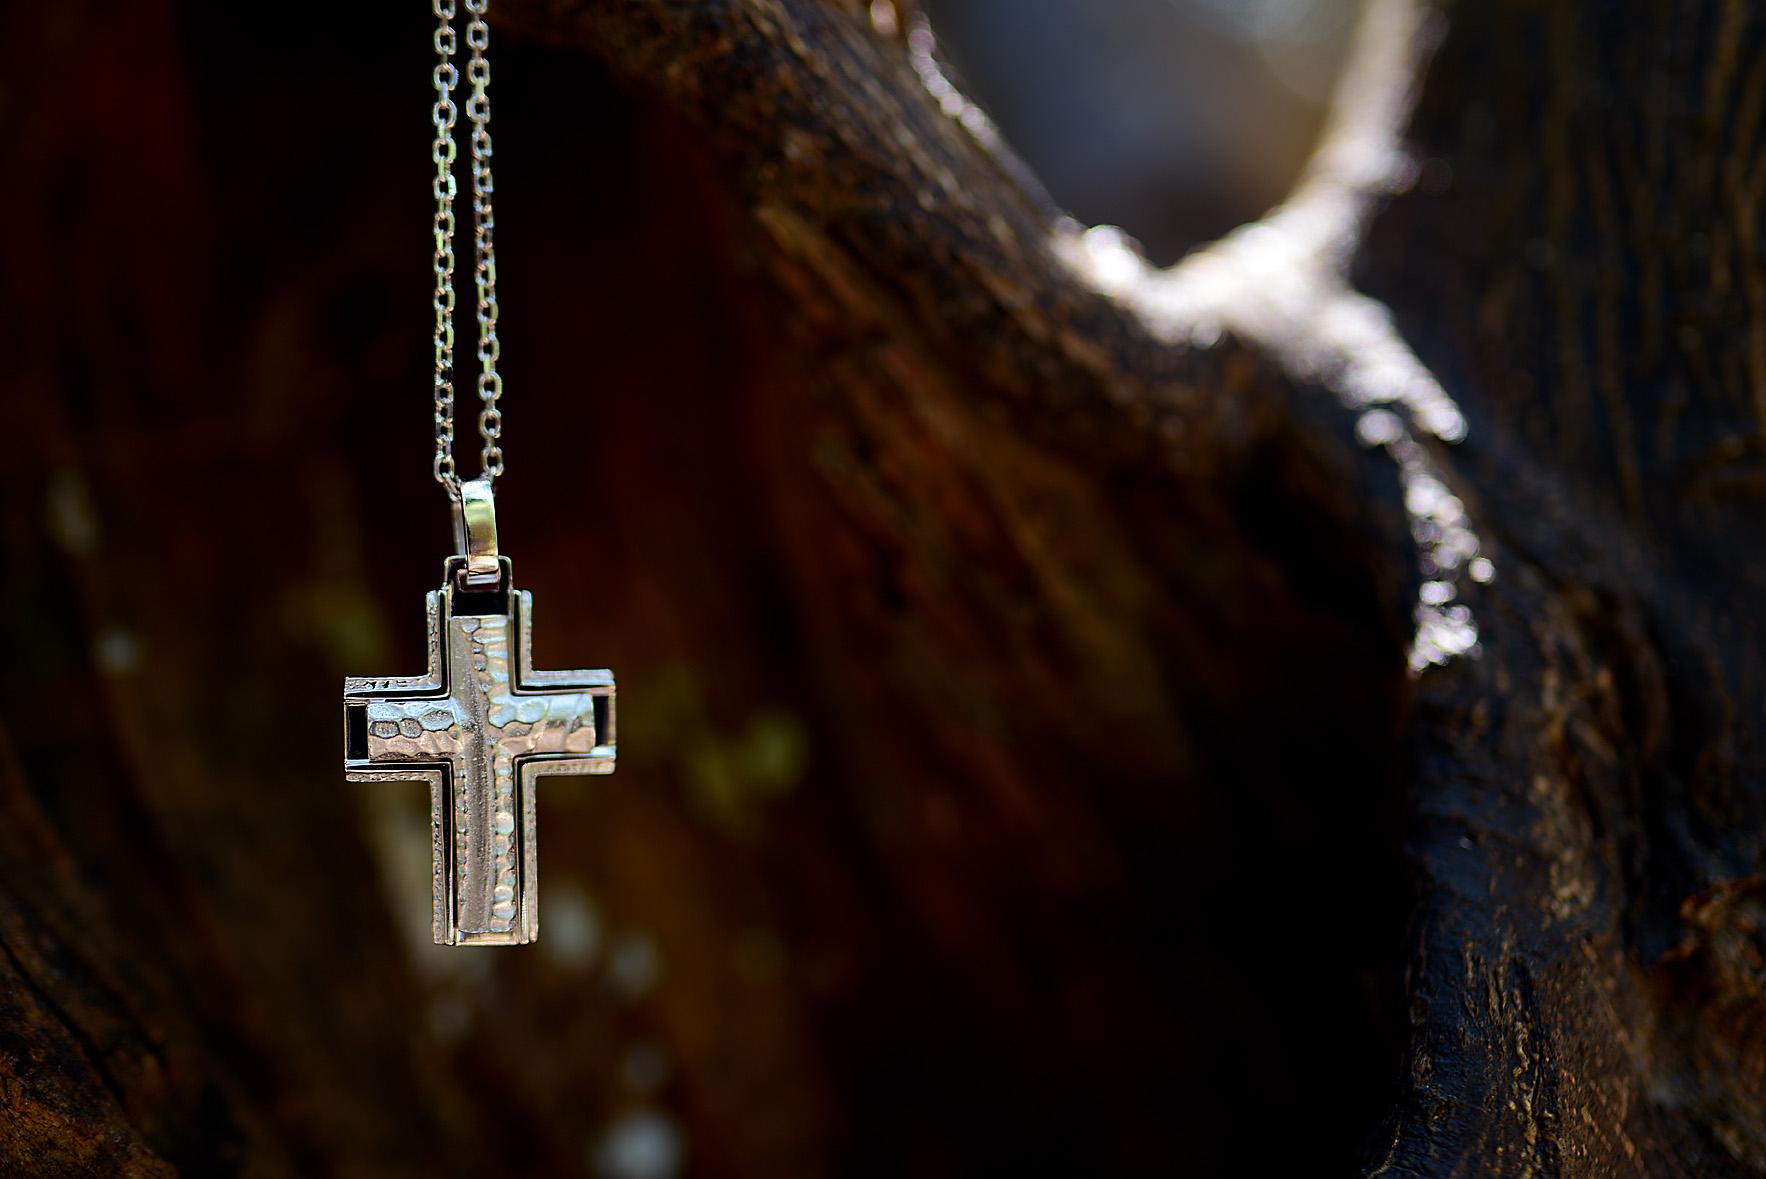 Baptism-details-chios-island-from-newyork-kambos-invitation-christening